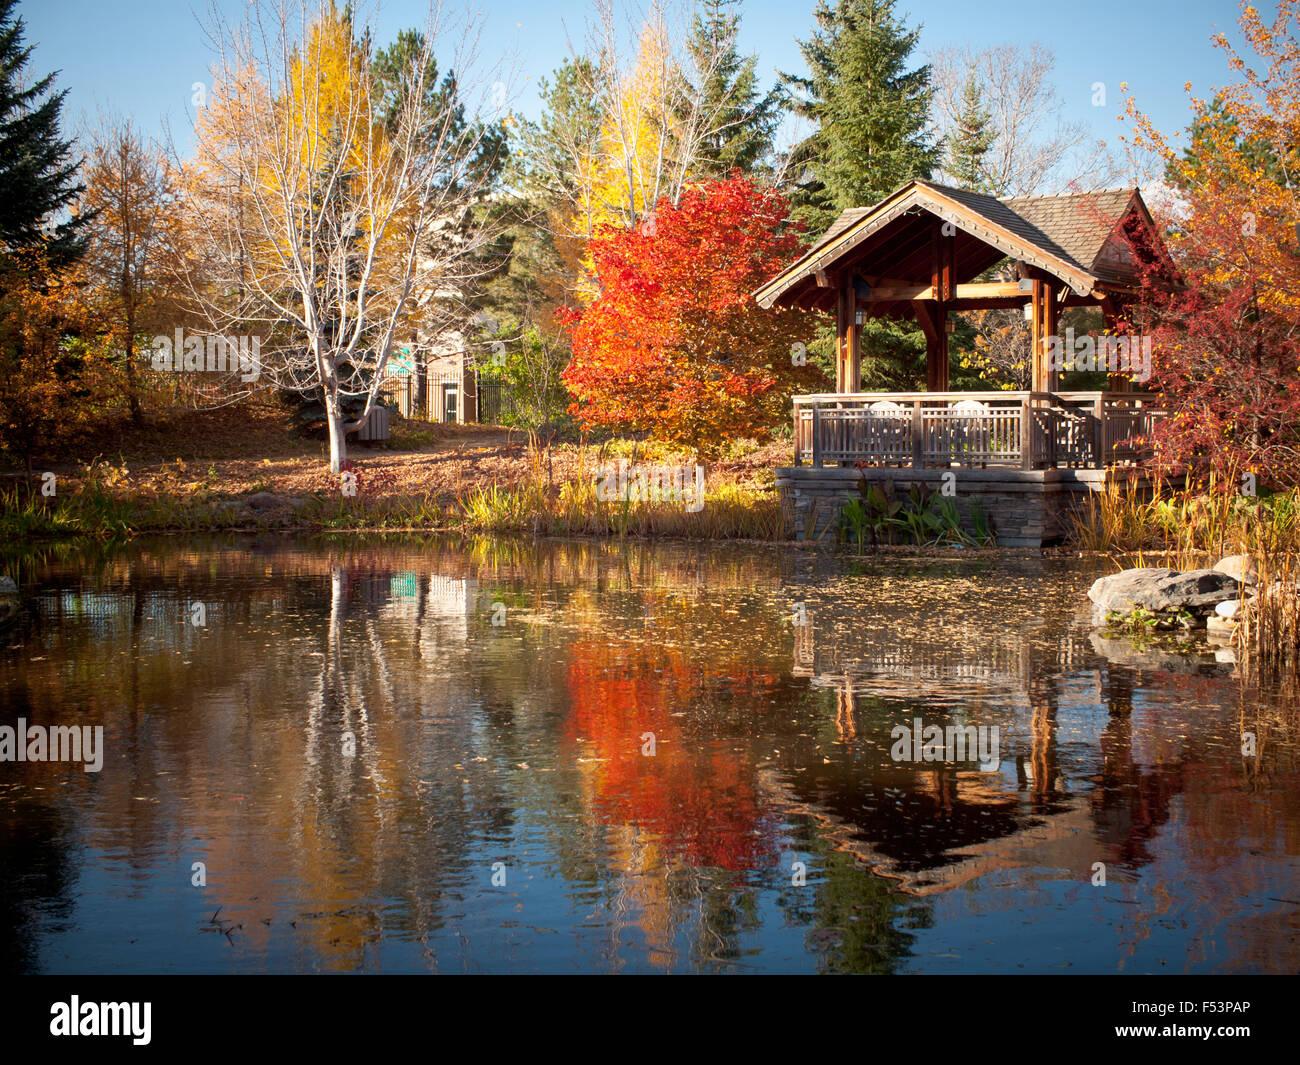 The covered pavilion and koi pond at Garden Park (Boffins Public House), Innovation Place in Saskatoon, Saskatchewan, Stock Photo